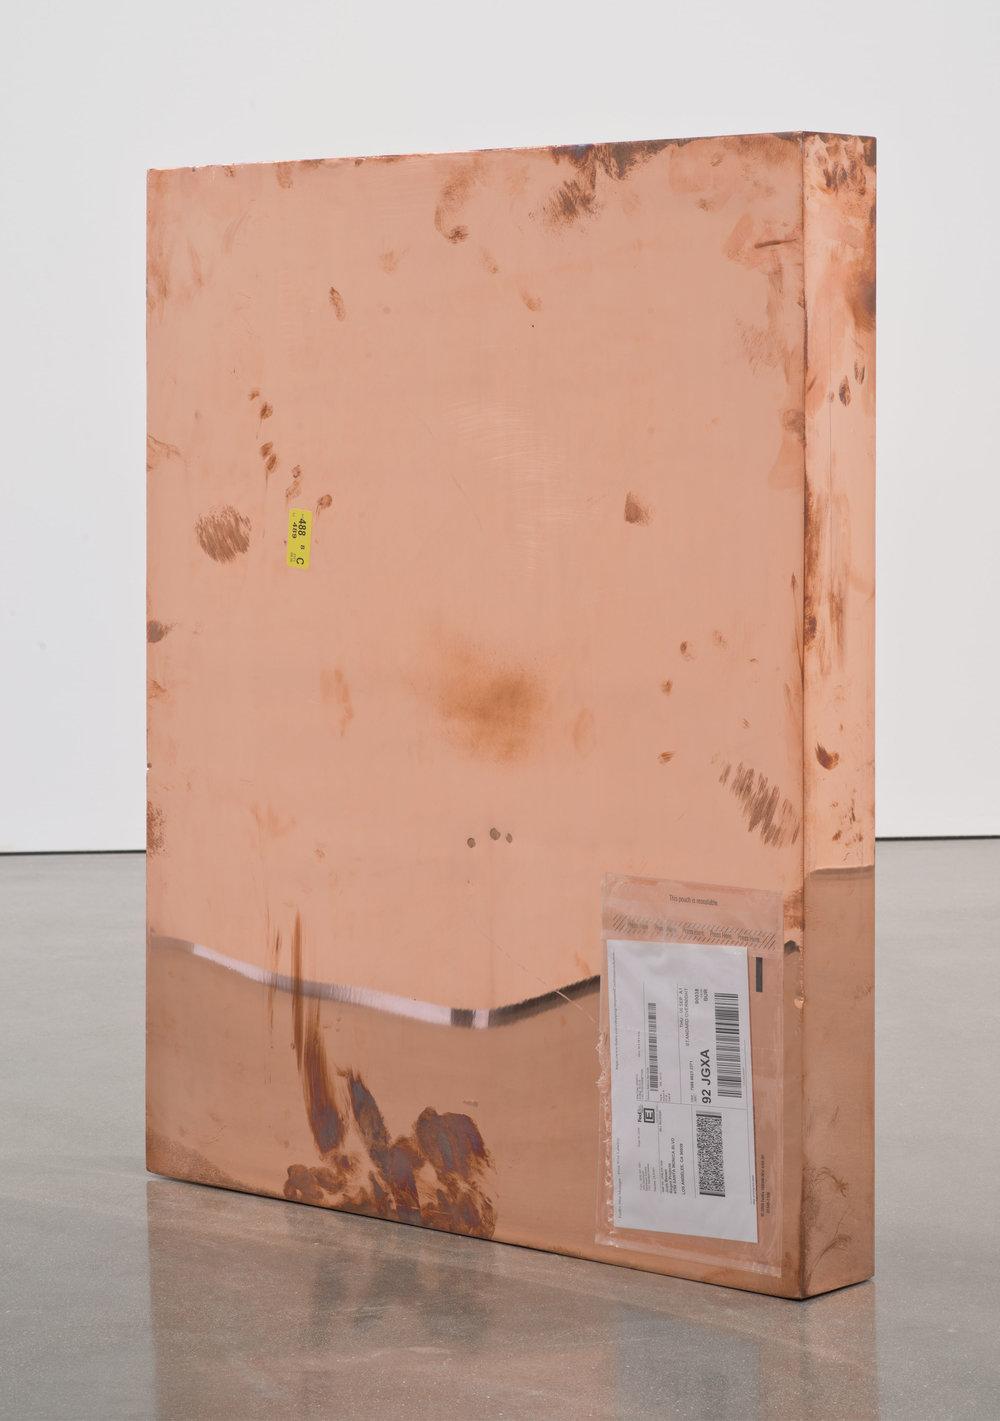 Copper (FedEx® Medium Framed Art Box  © 2011 FedEx 163095 REV 7/11), Standard Overnight, Glendale–Los Angeles trk#798886232371, September 5–6, 2012   2012–  Polished copper, accrued FedEx shipping and tracking labels  33 3/4 x 28 x 4 inches   FedEx Copper Works, 2009–